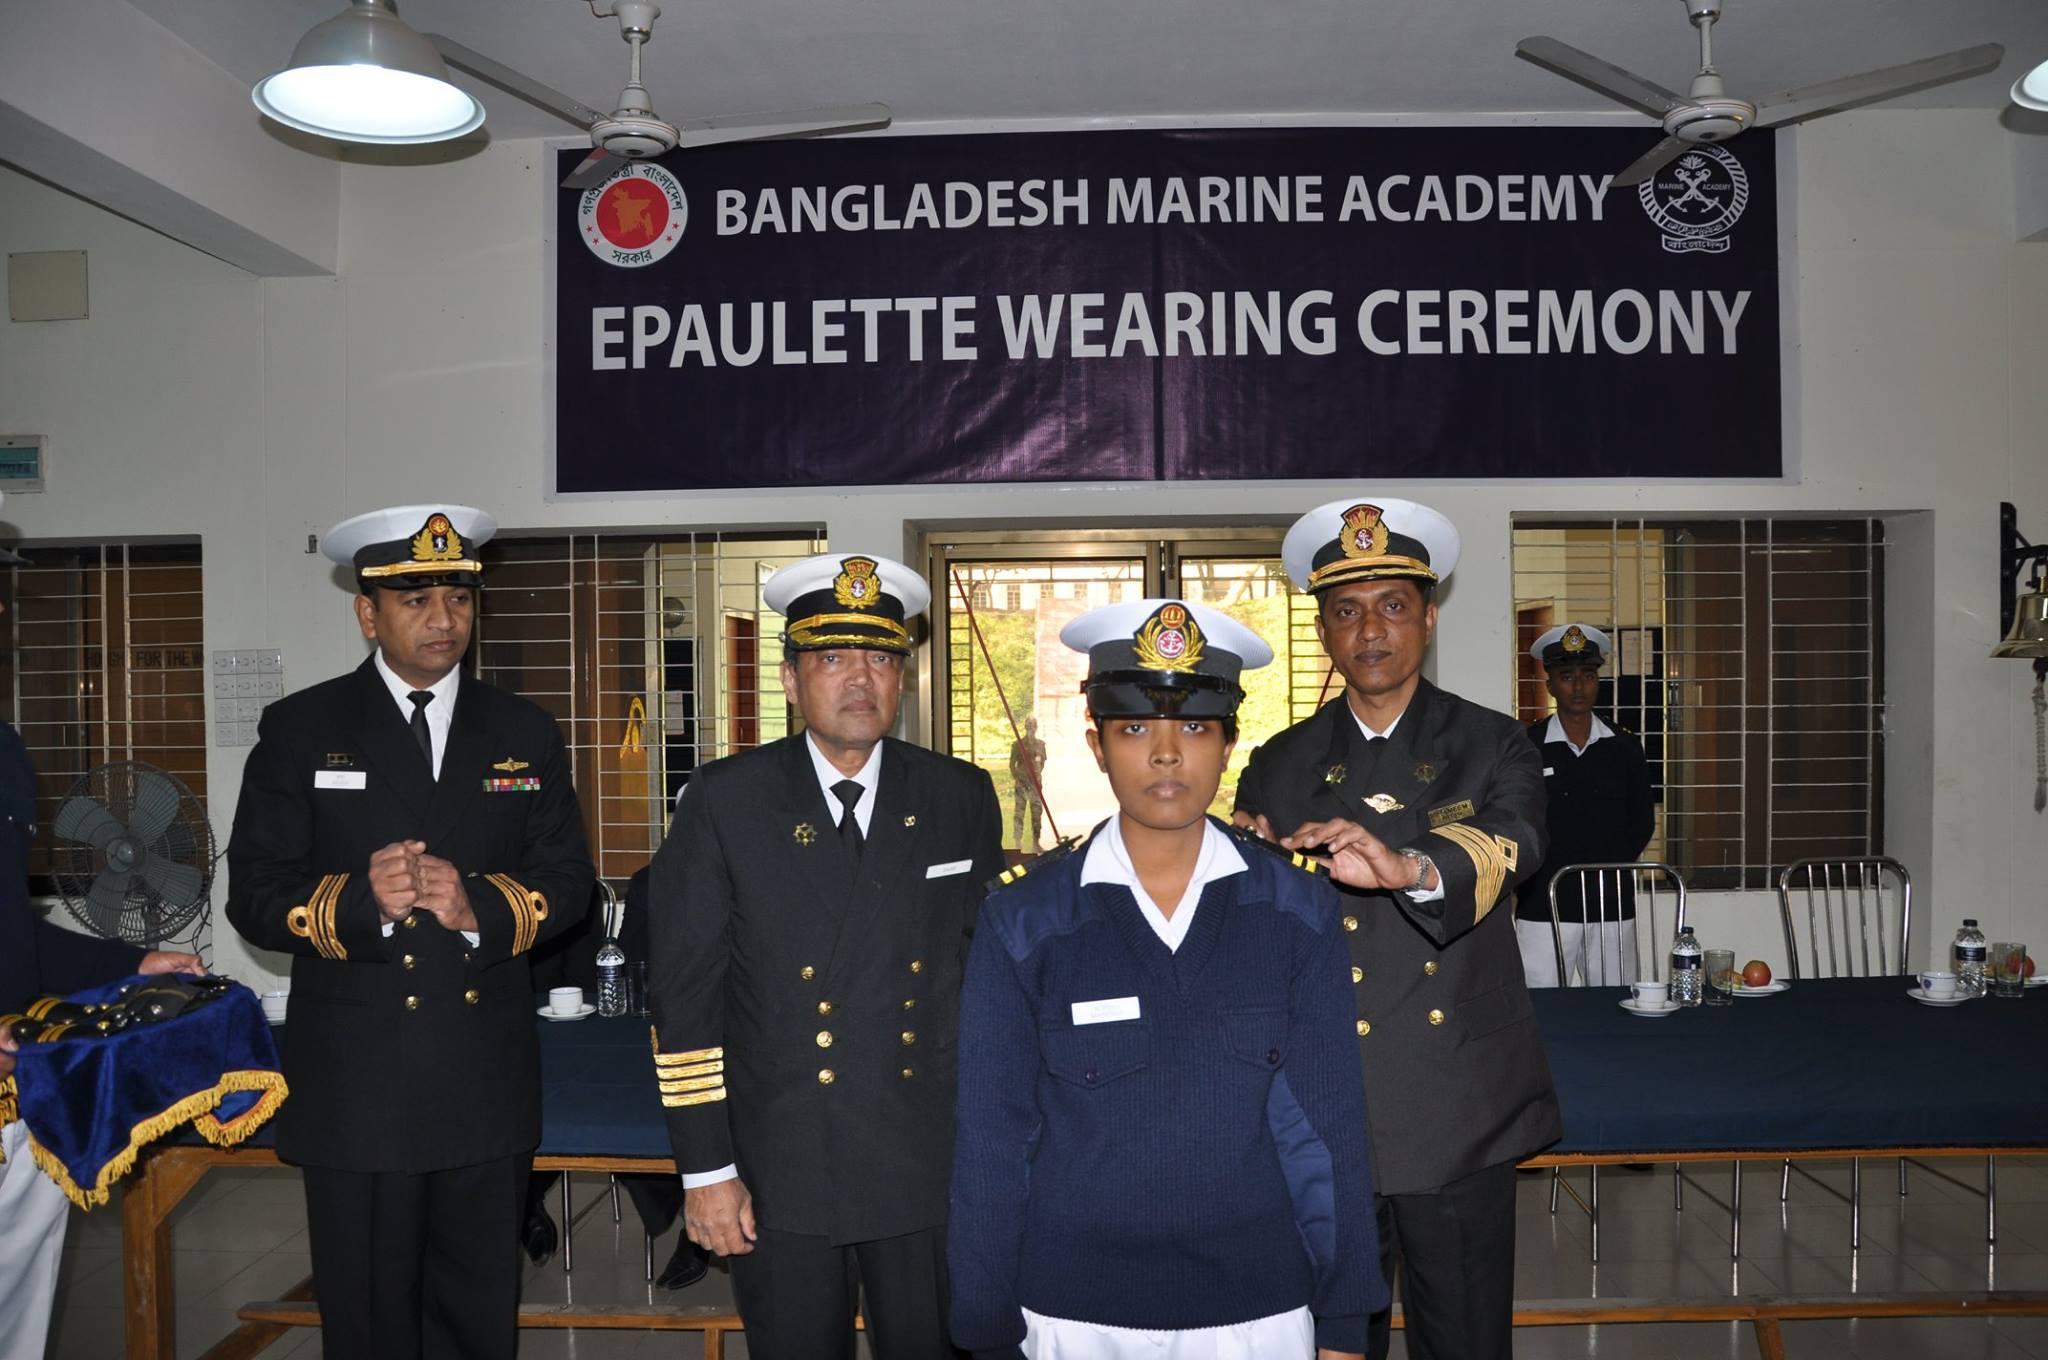 'Senior Cadet' Epaulette Wearing Ceremony – 54th Batch